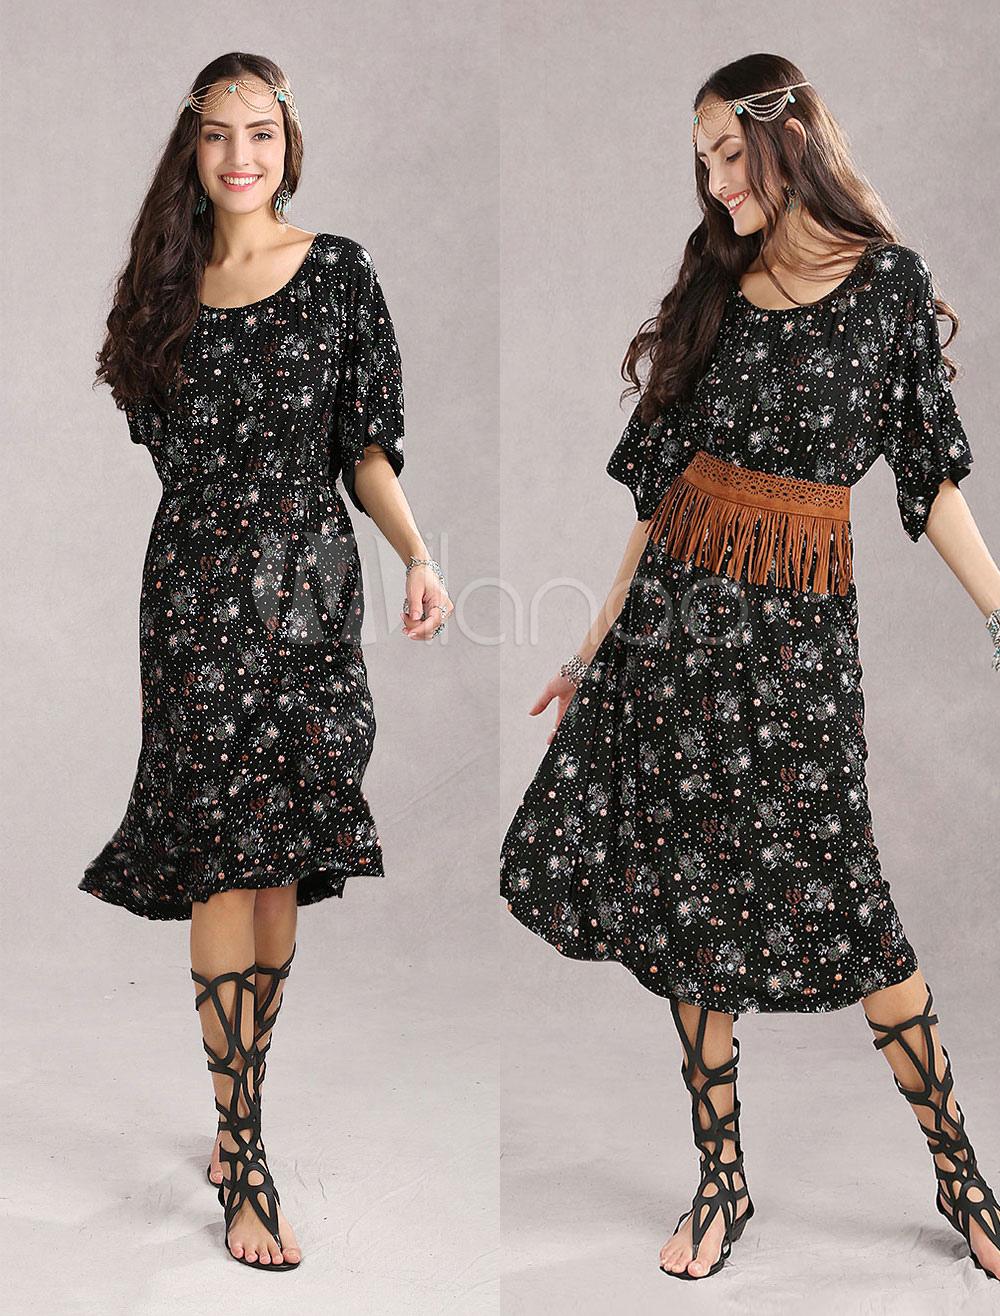 Vintage Red Floral 70% Cotton 30% Spandex Womens Dress (Women\\'s Clothing Bohemian Dresses) photo